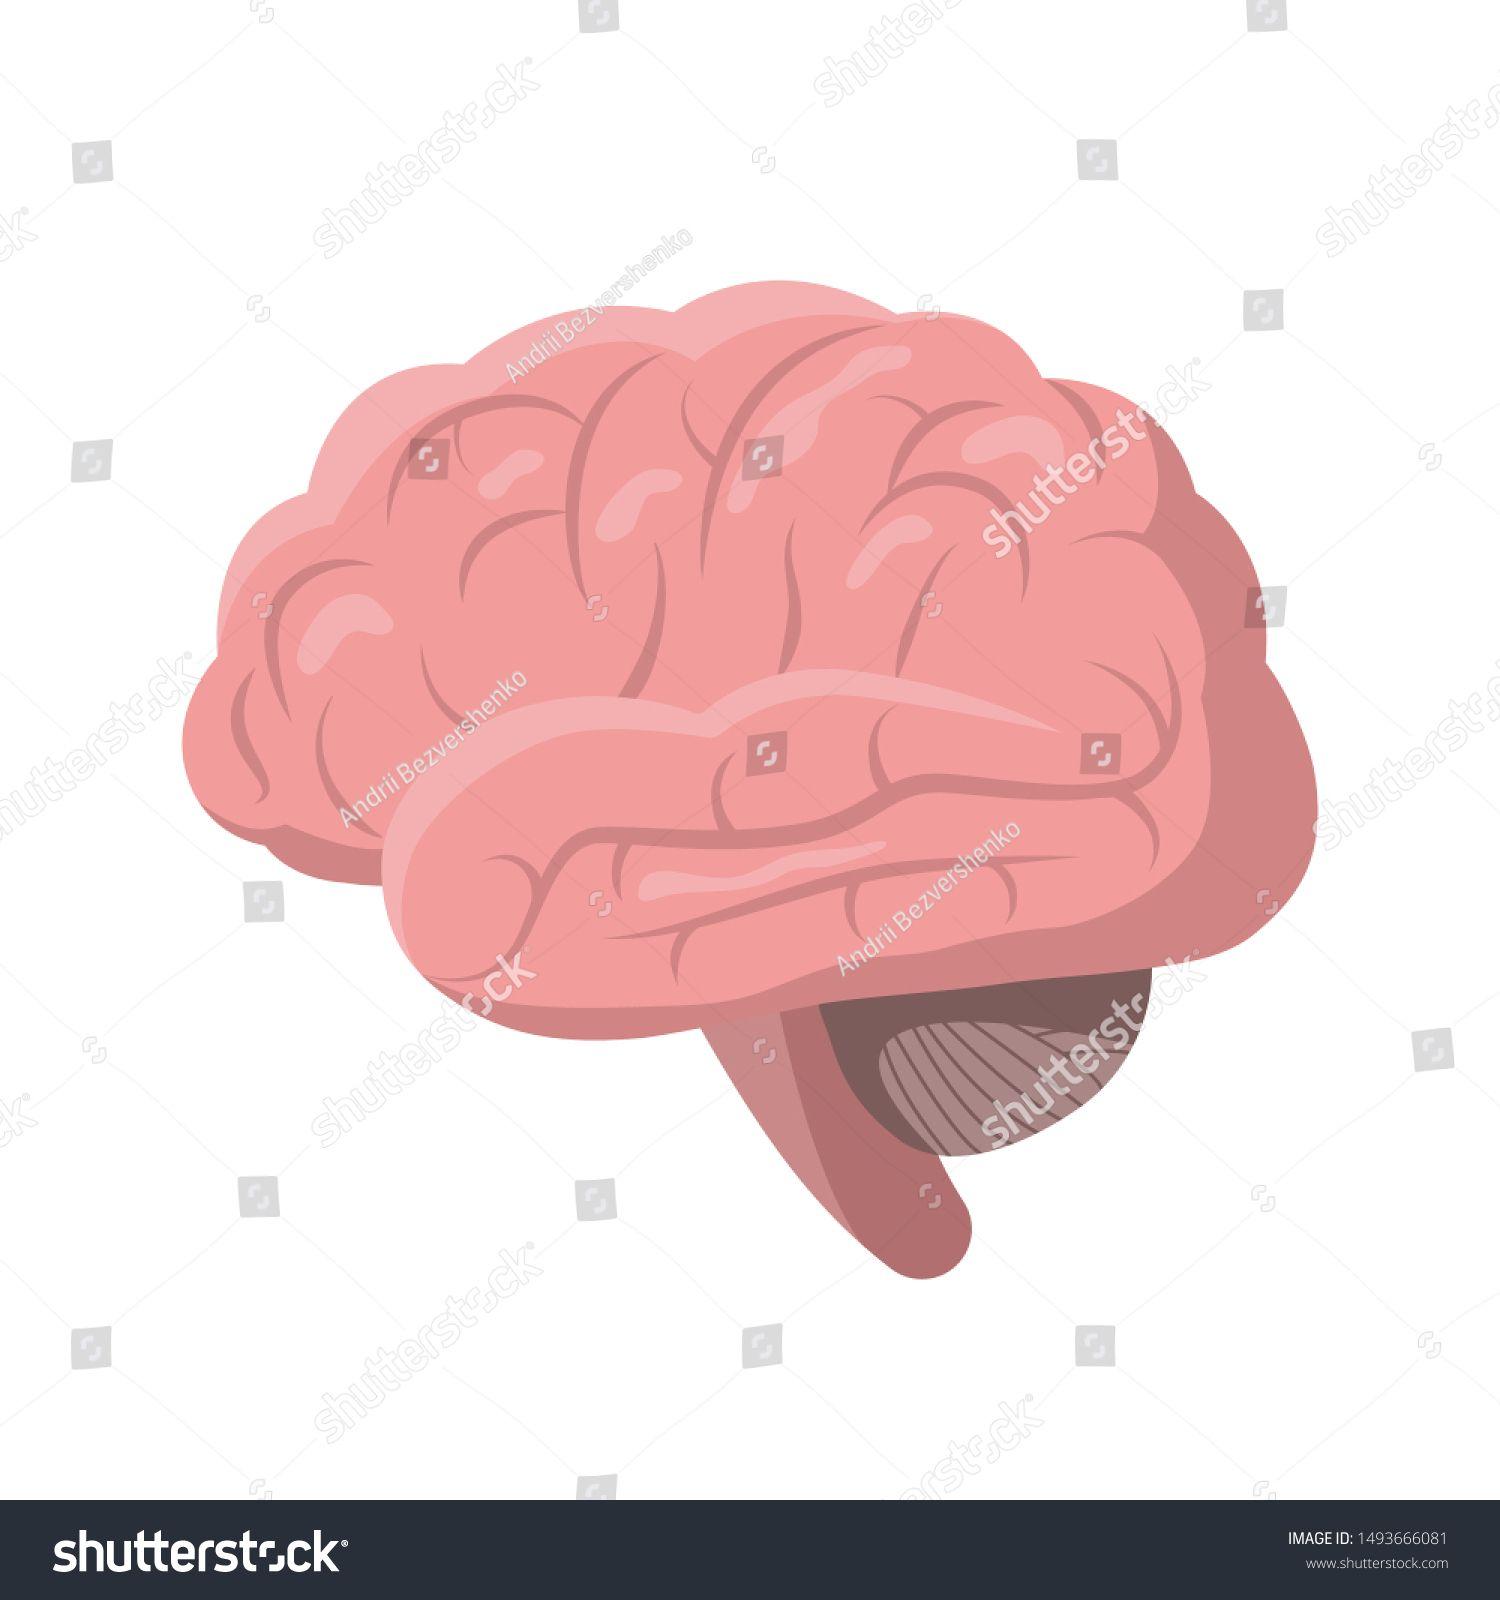 1458+ Teachers Love Brains Svg Zip File